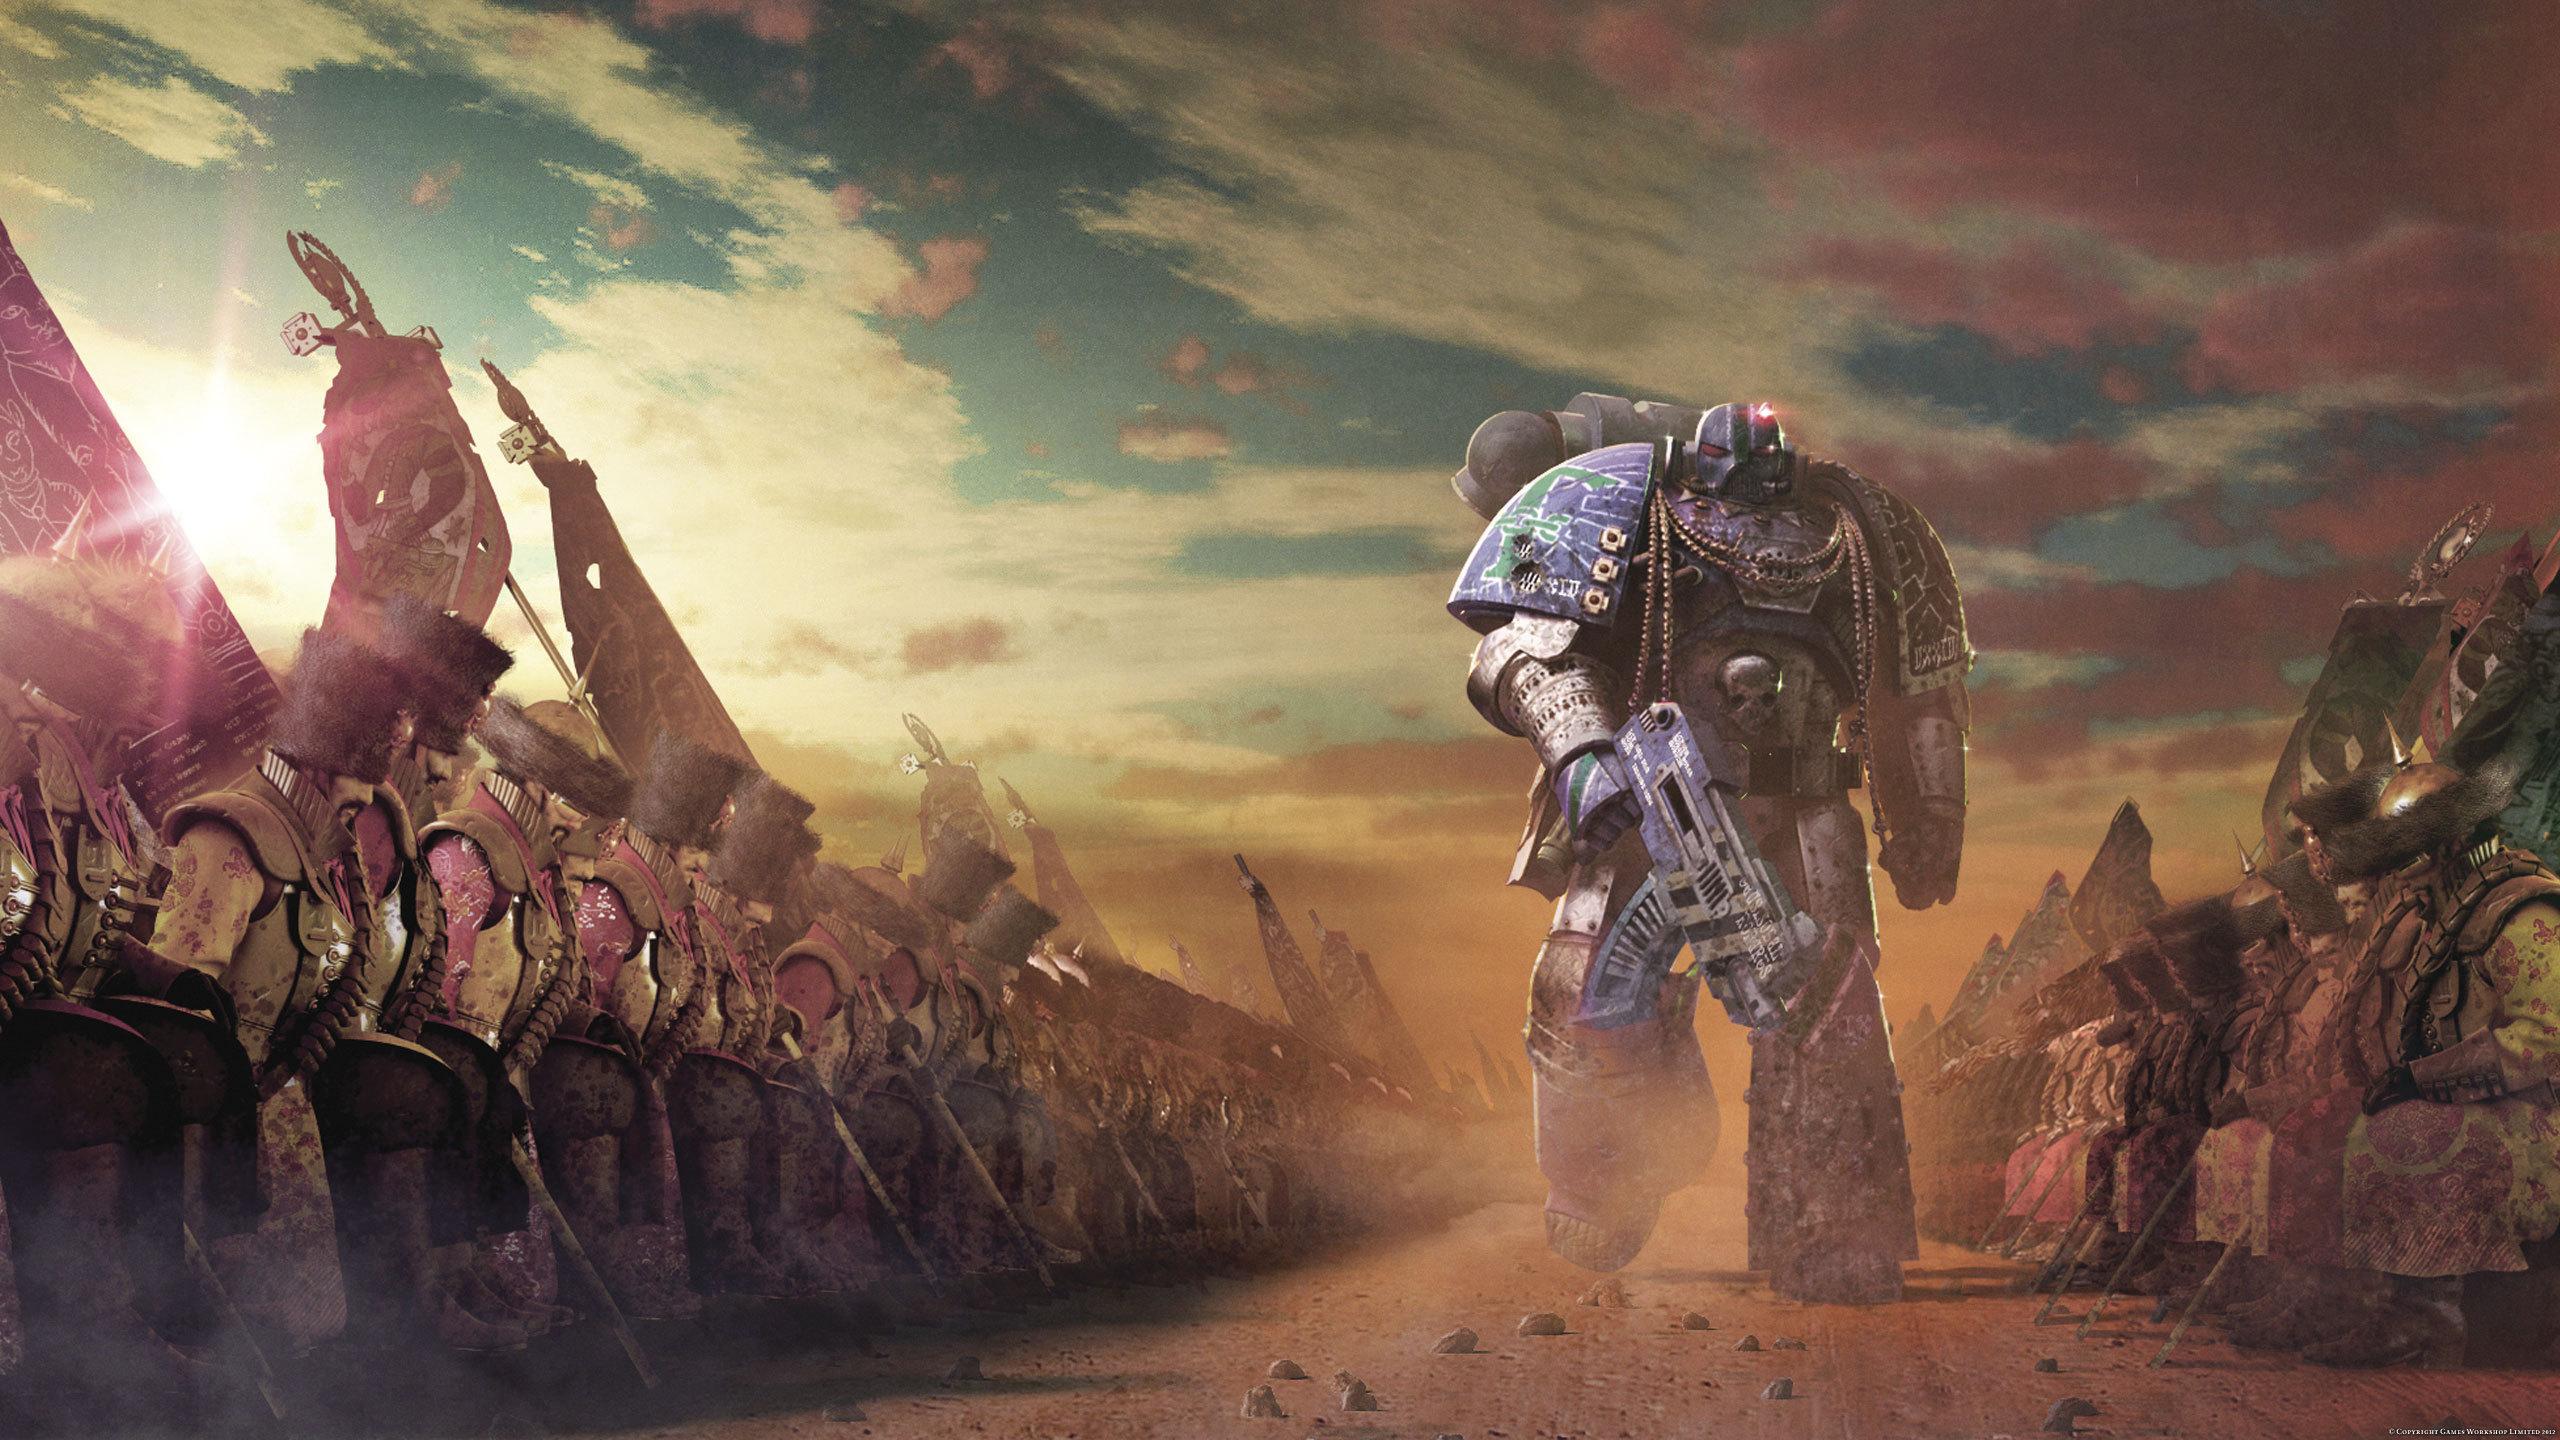 HQ Warhammer 40K Wallpapers | File 695.77Kb